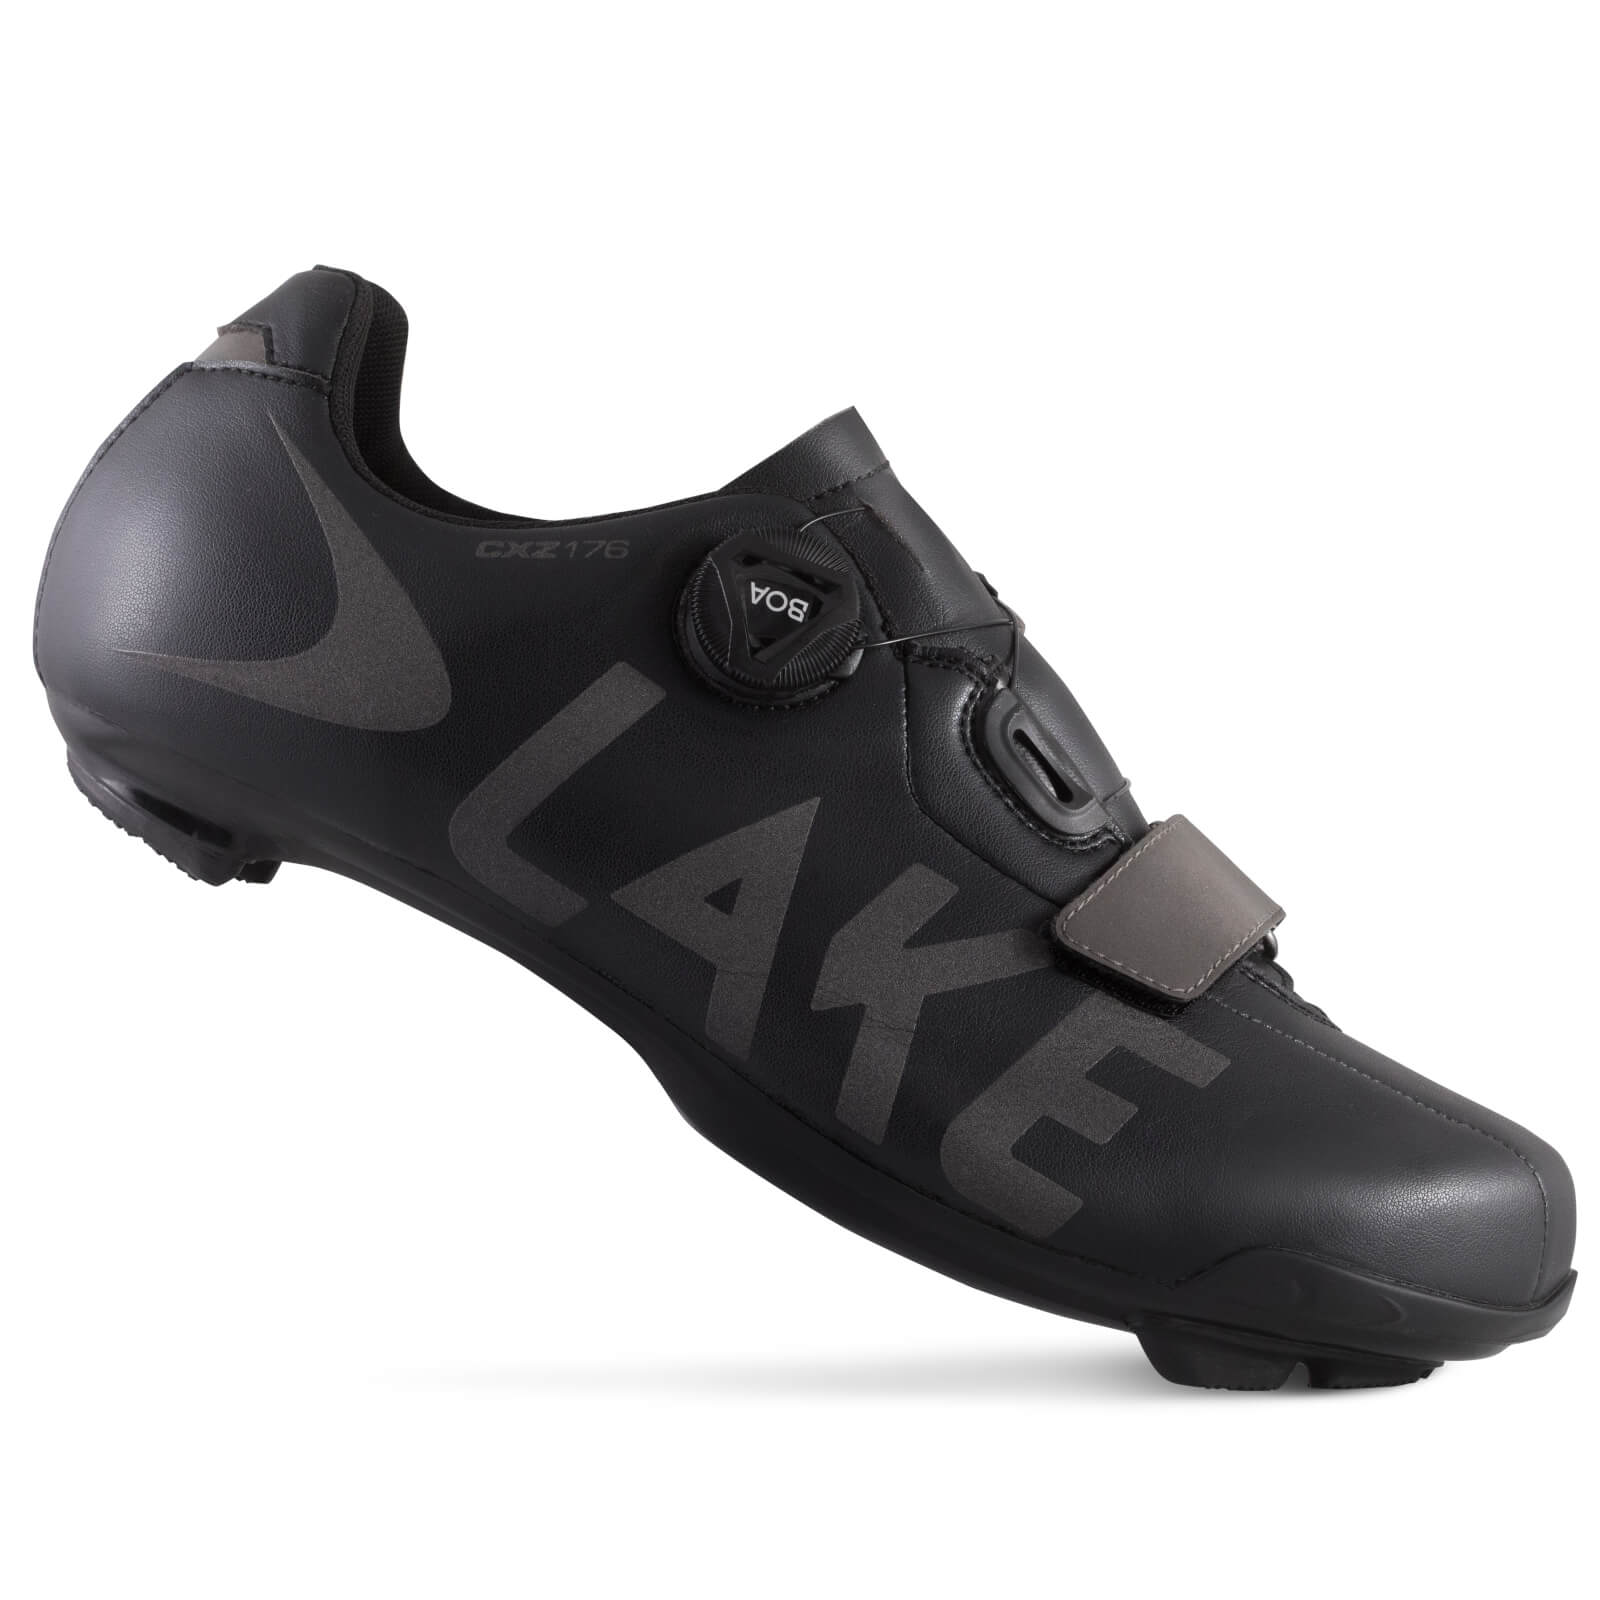 Cycling Lake CXZ176 Road Shoes - EU 41